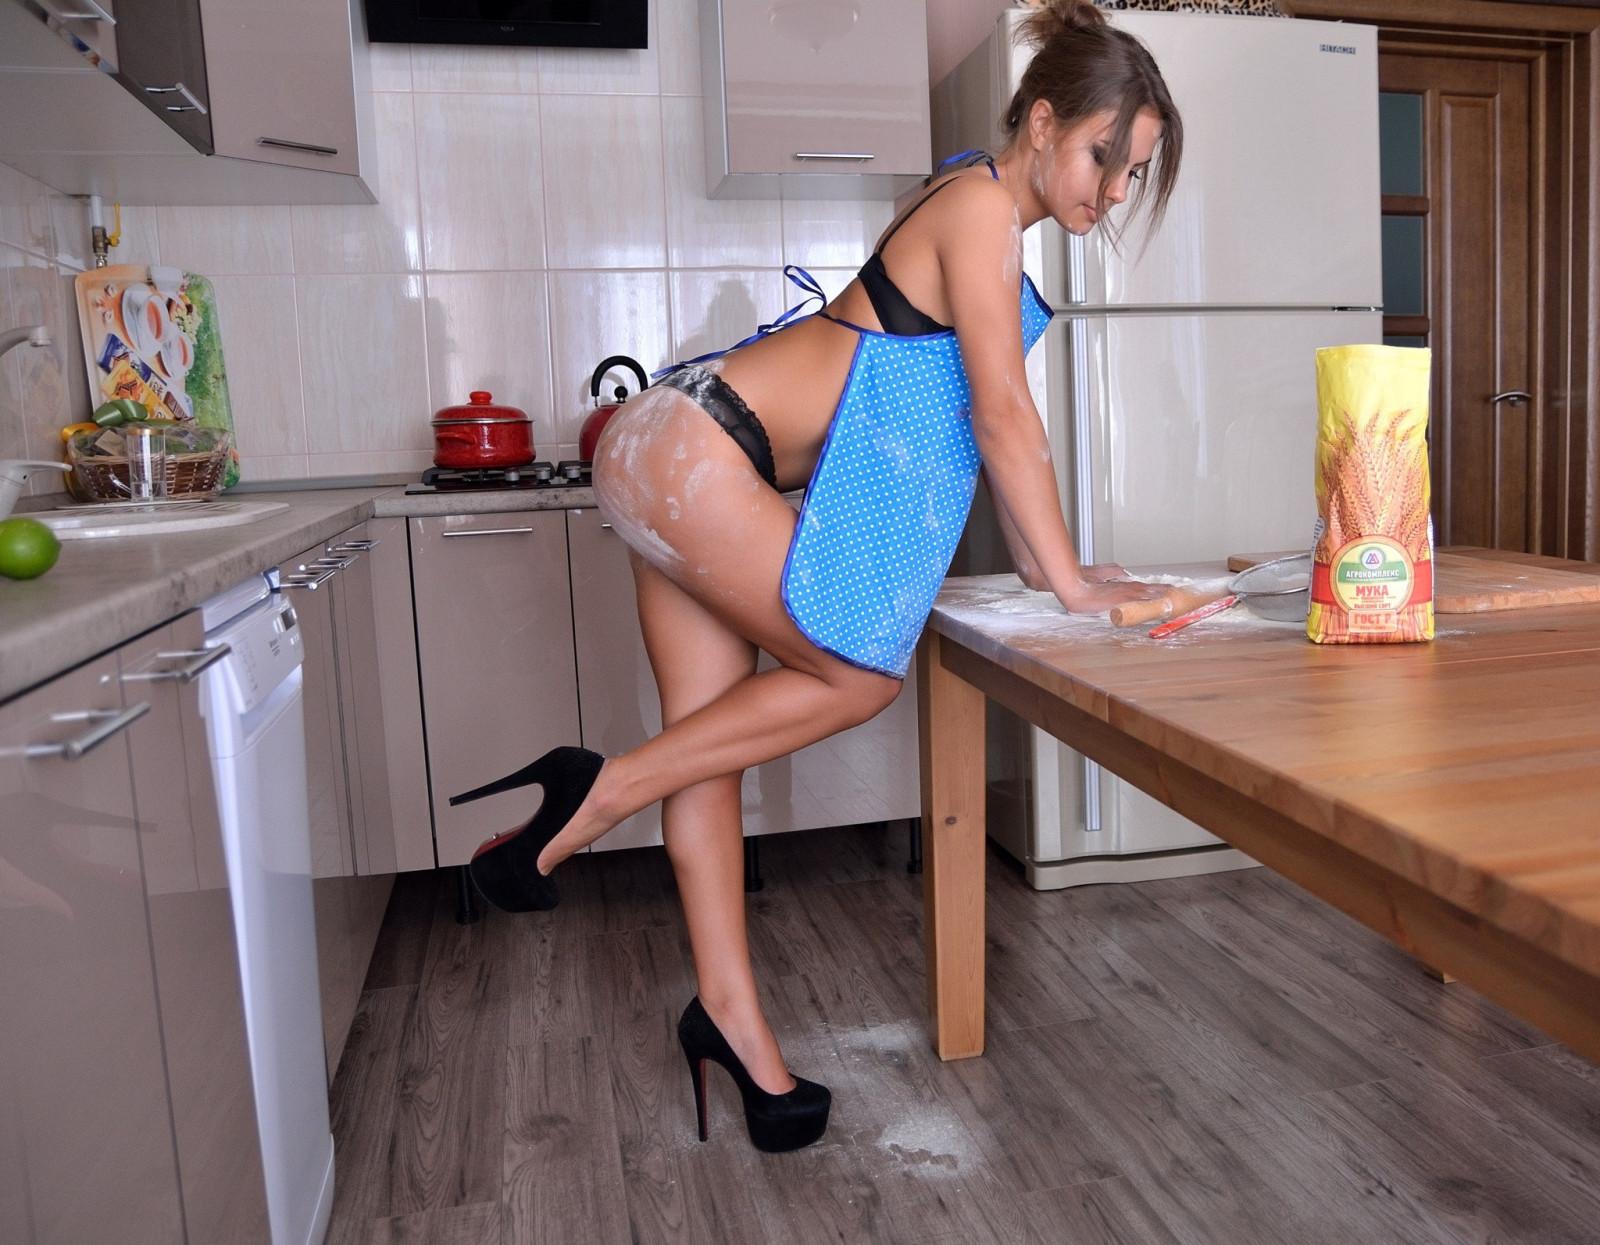 девушка в фартуке на кухне порно видео вижу еще